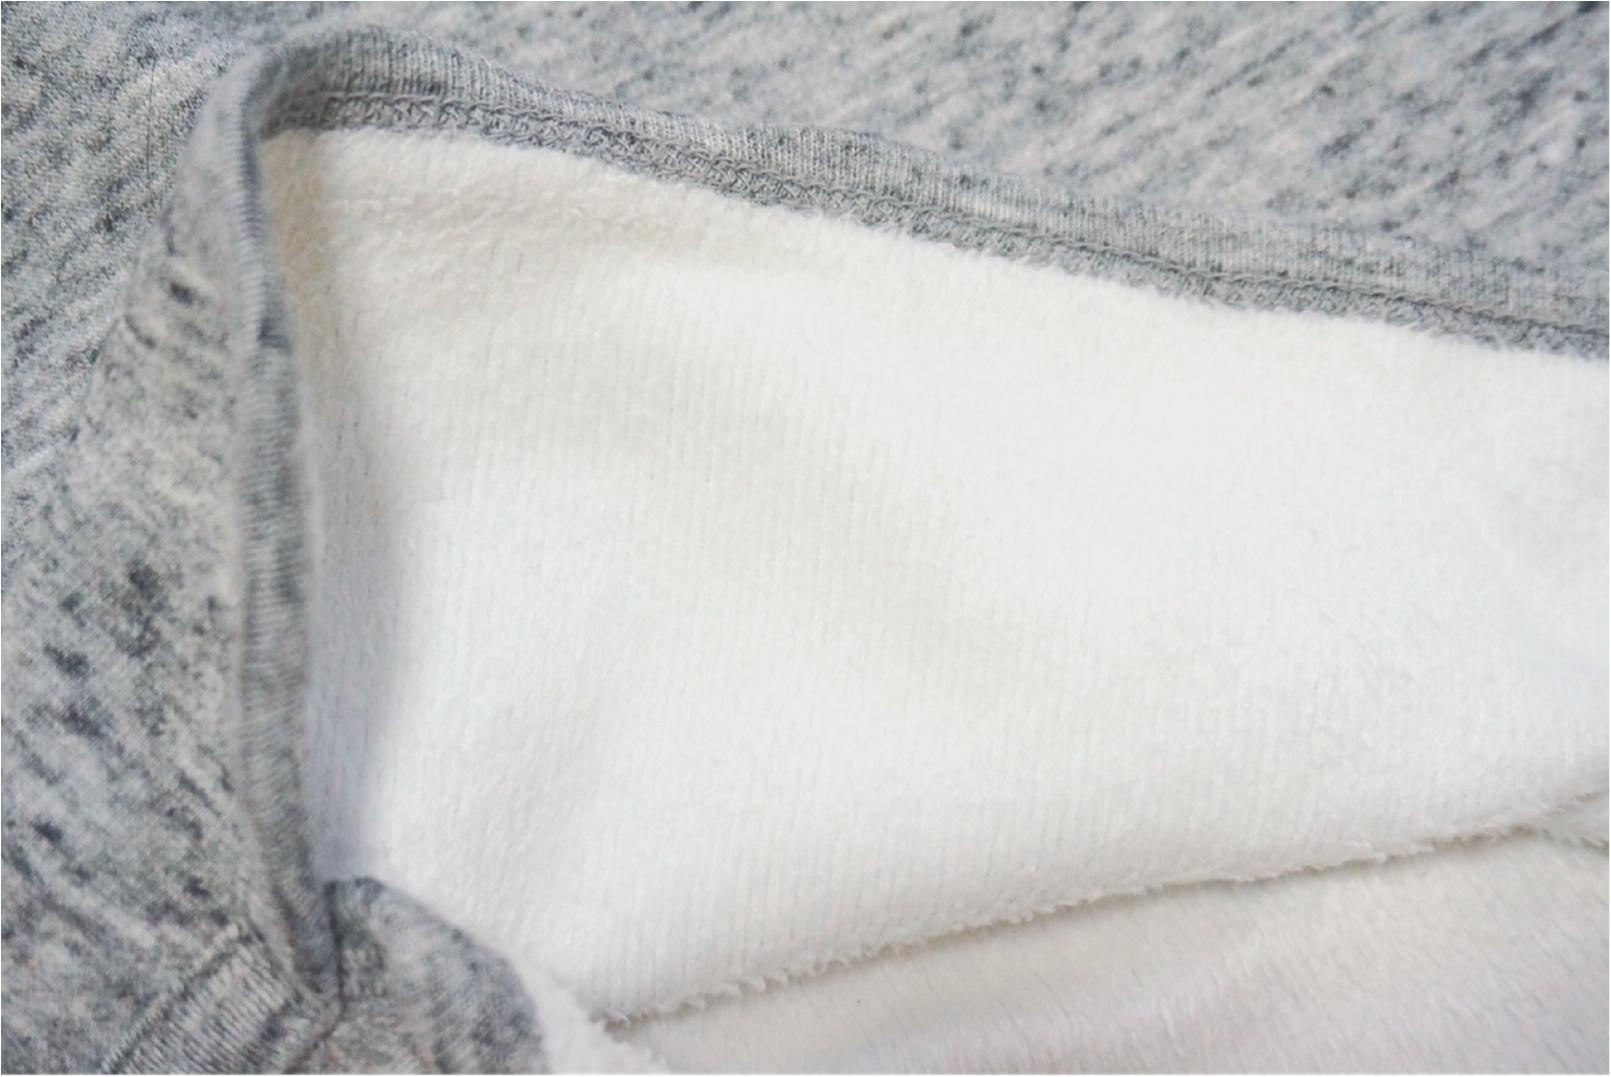 【UNIQLO誕生感謝祭第3弾!】寒い冬もこれで暖か&快適に❤️着回しもしやすい《優秀スカート》を色ち買い!_3